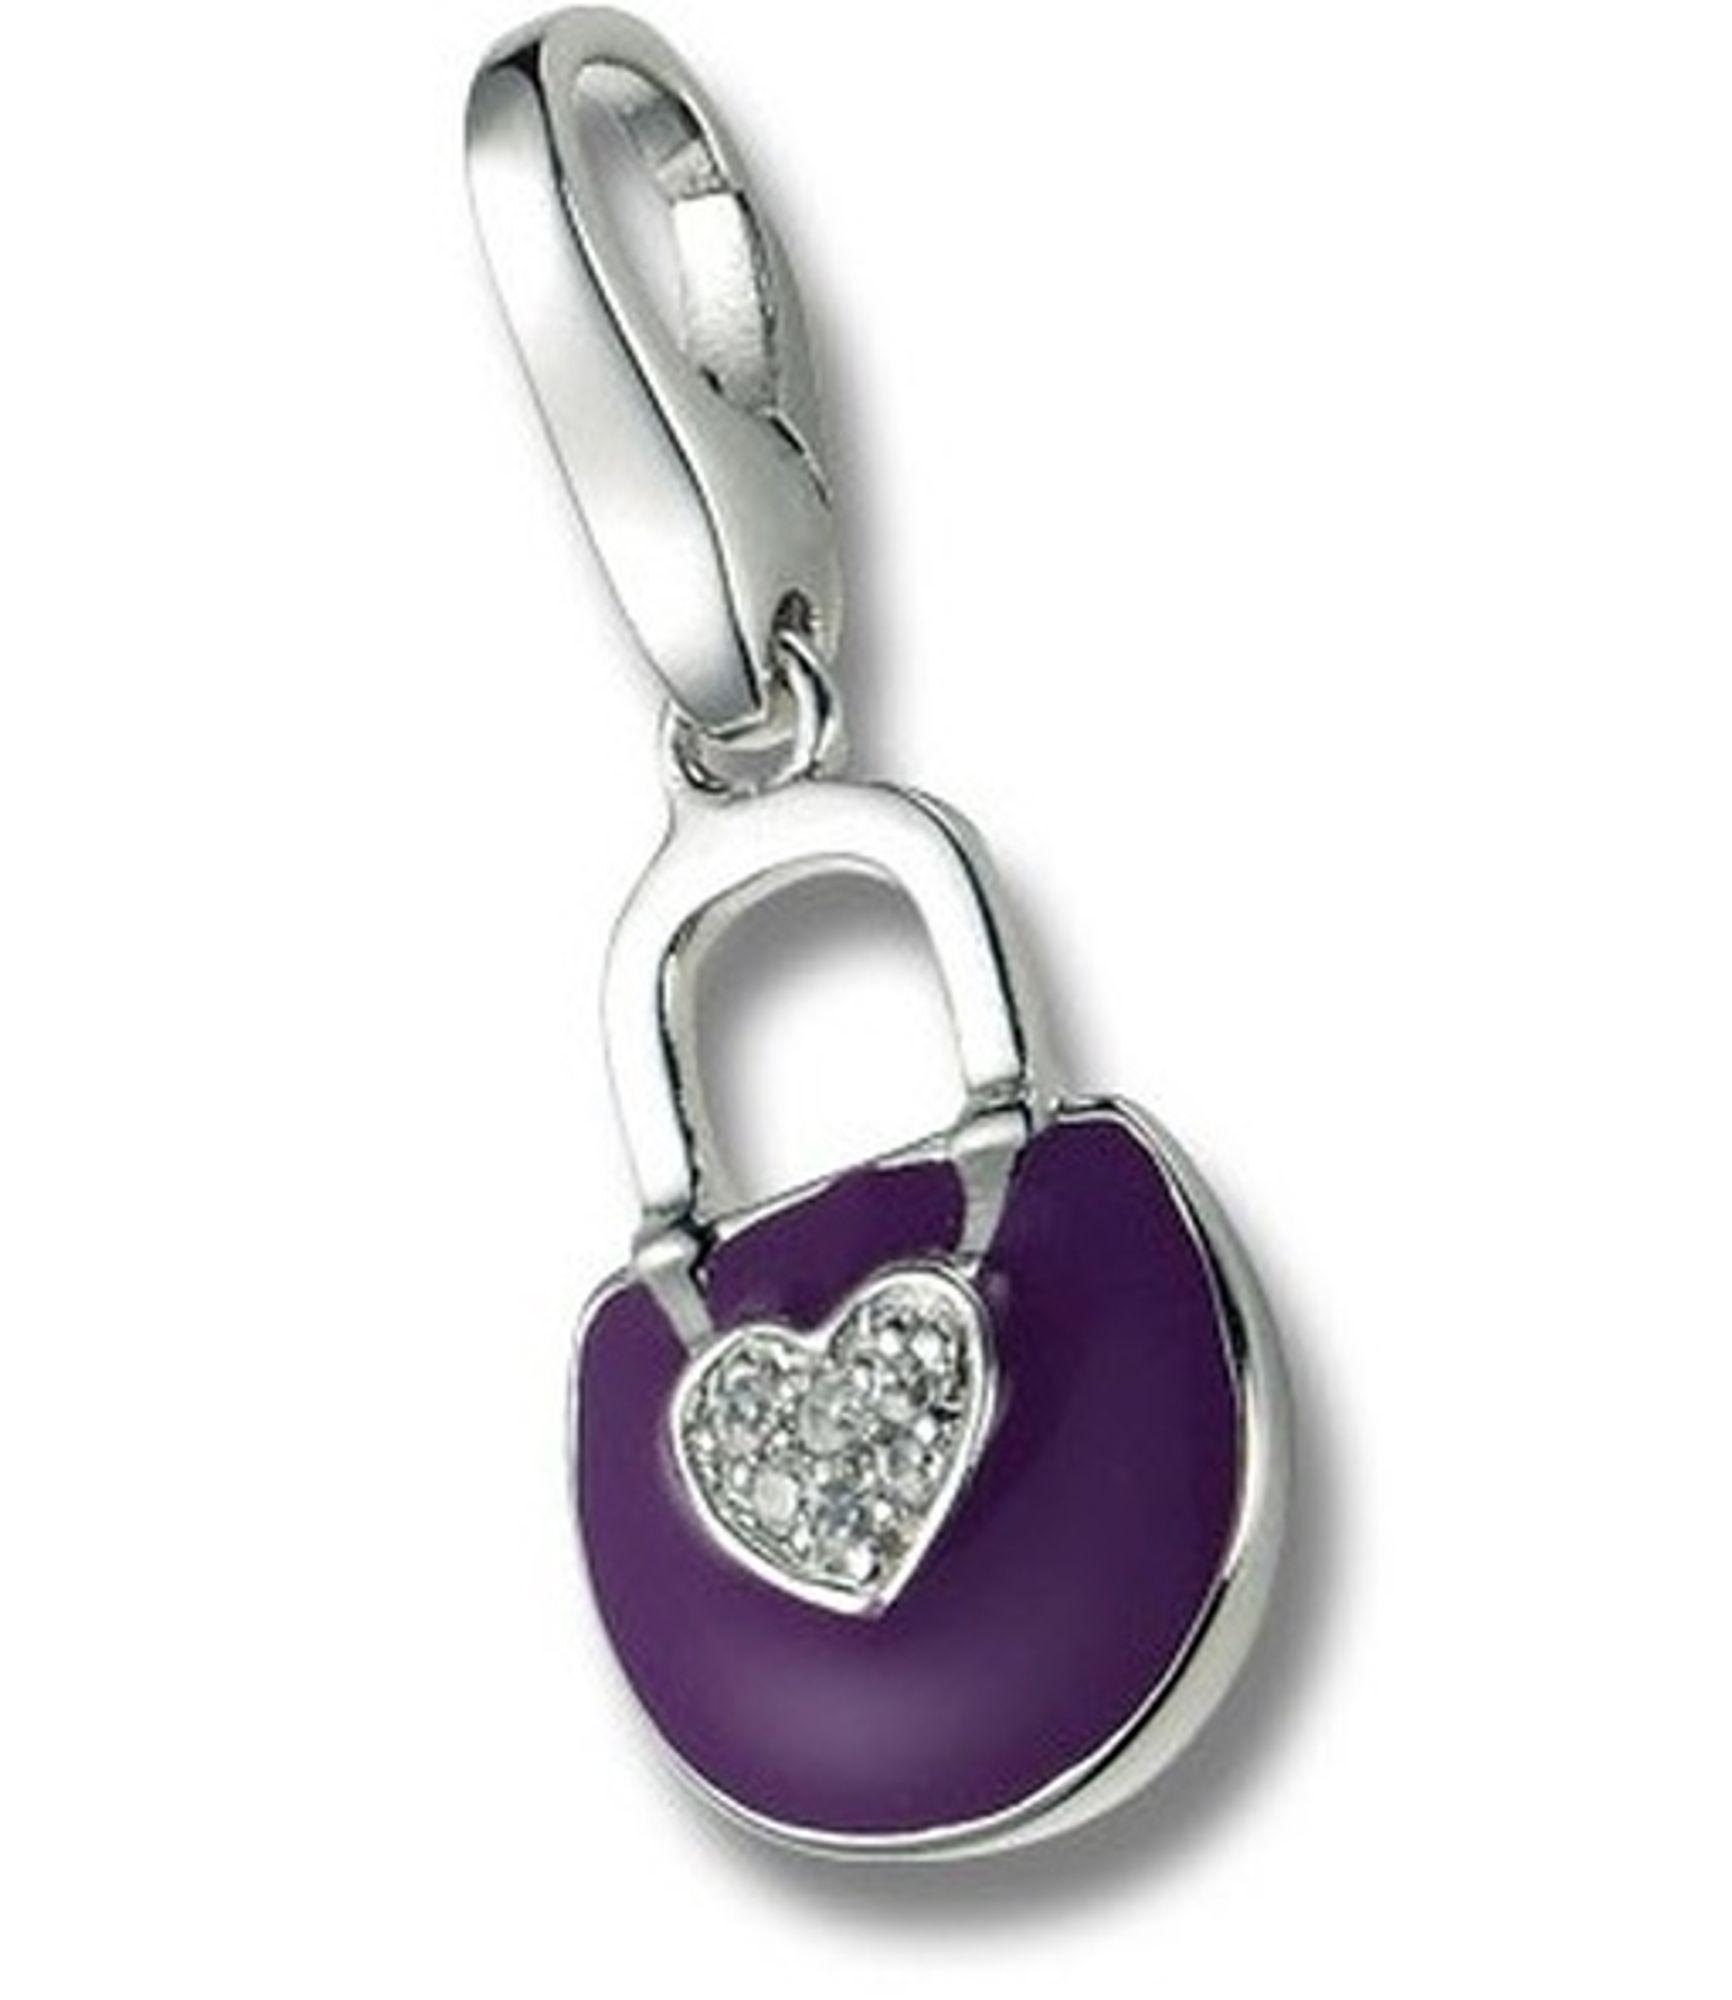 Giorgio Martello 356-806949 Charms Damen Charm Silber Tasche violett